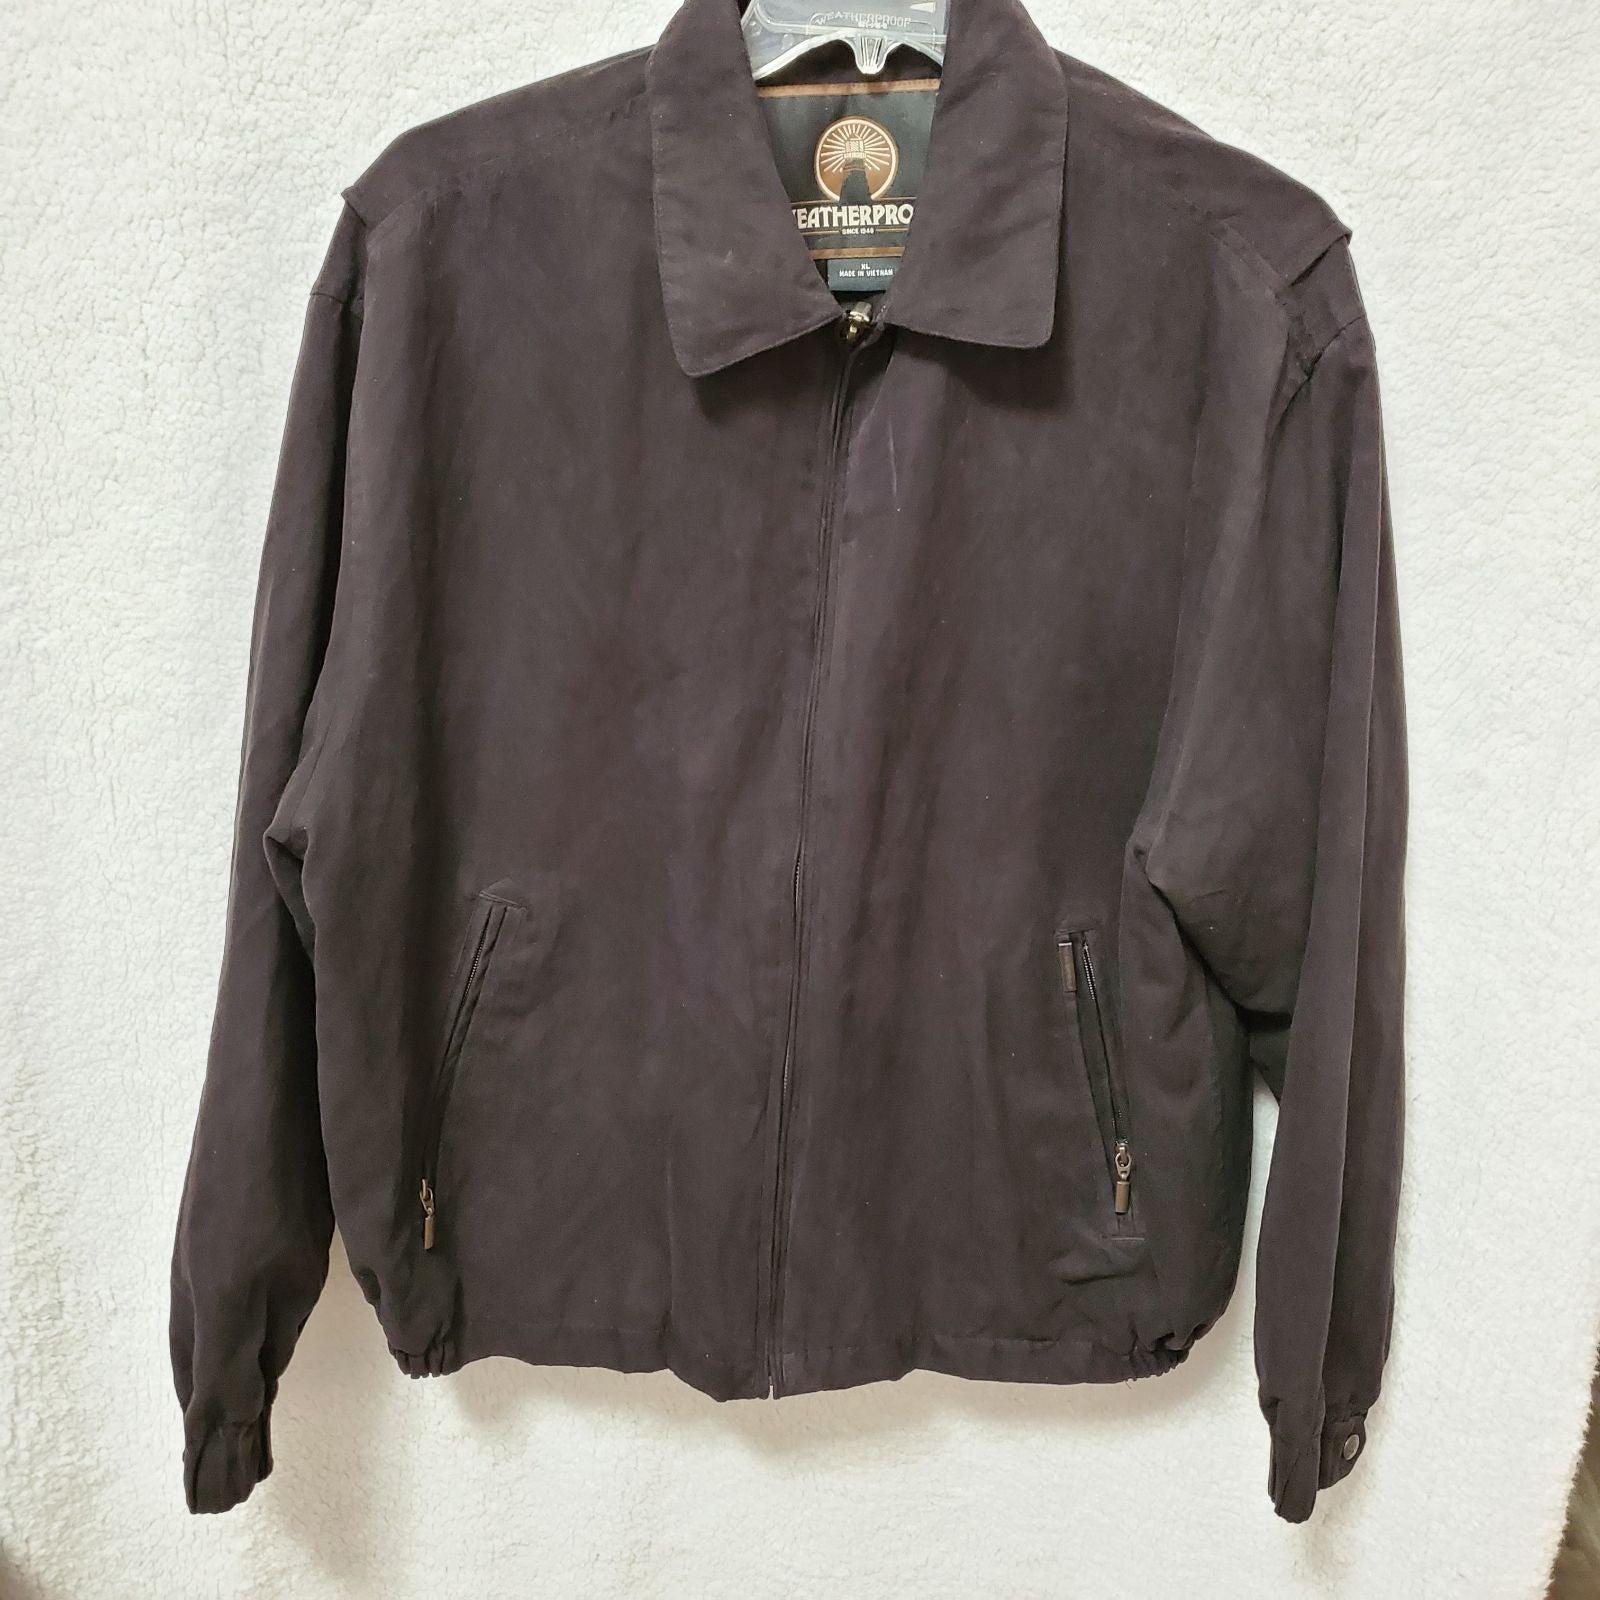 """Weatherproof"" Microsuede Jacket in SzXL"